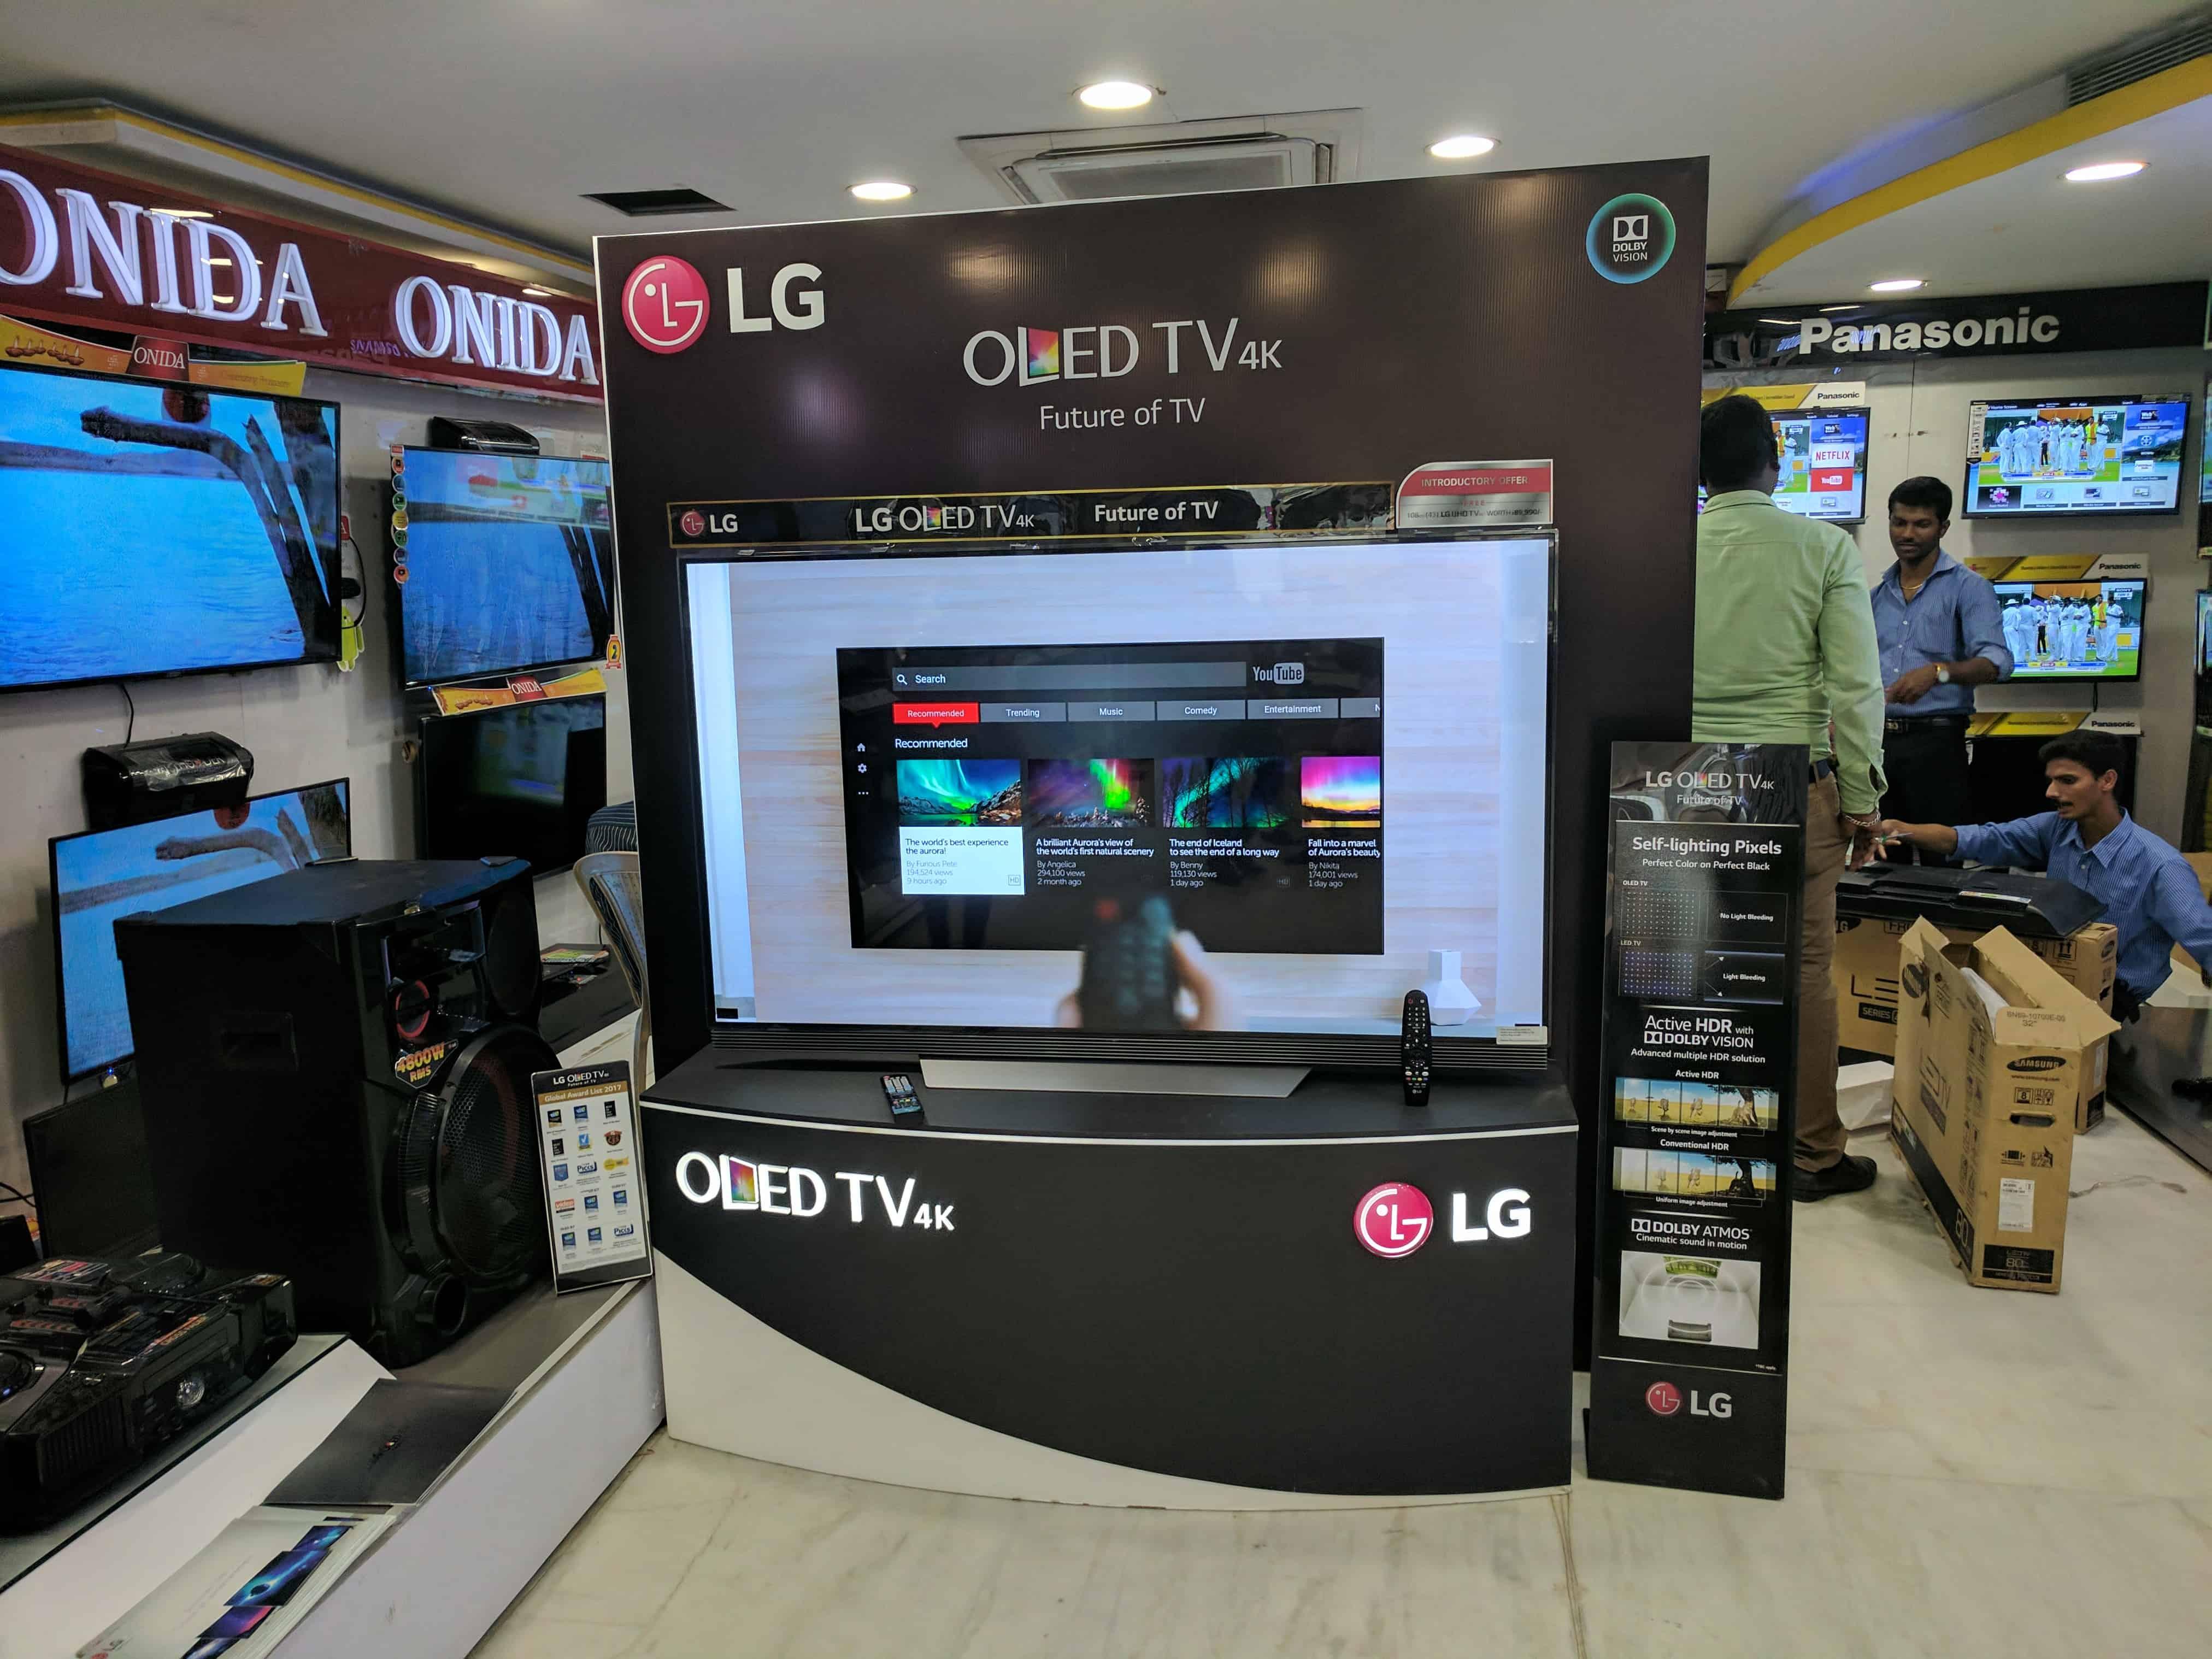 LG OLED E7 Series